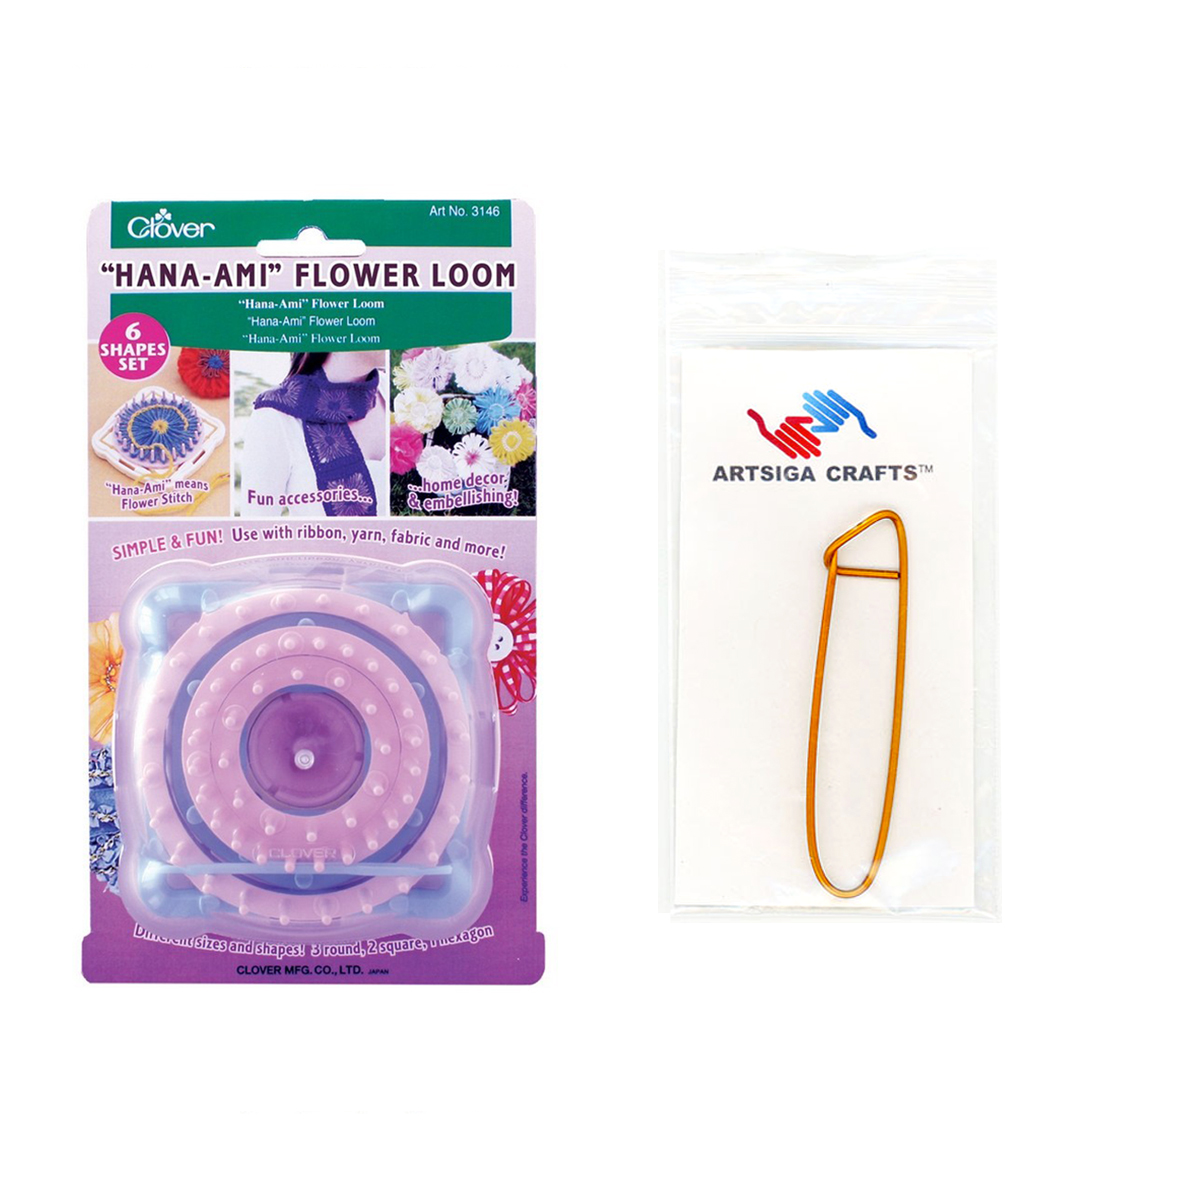 Clover Bundle: Hana-Ami Flower Loom + 1 Artsiga Crafts Stitch Holder 3146